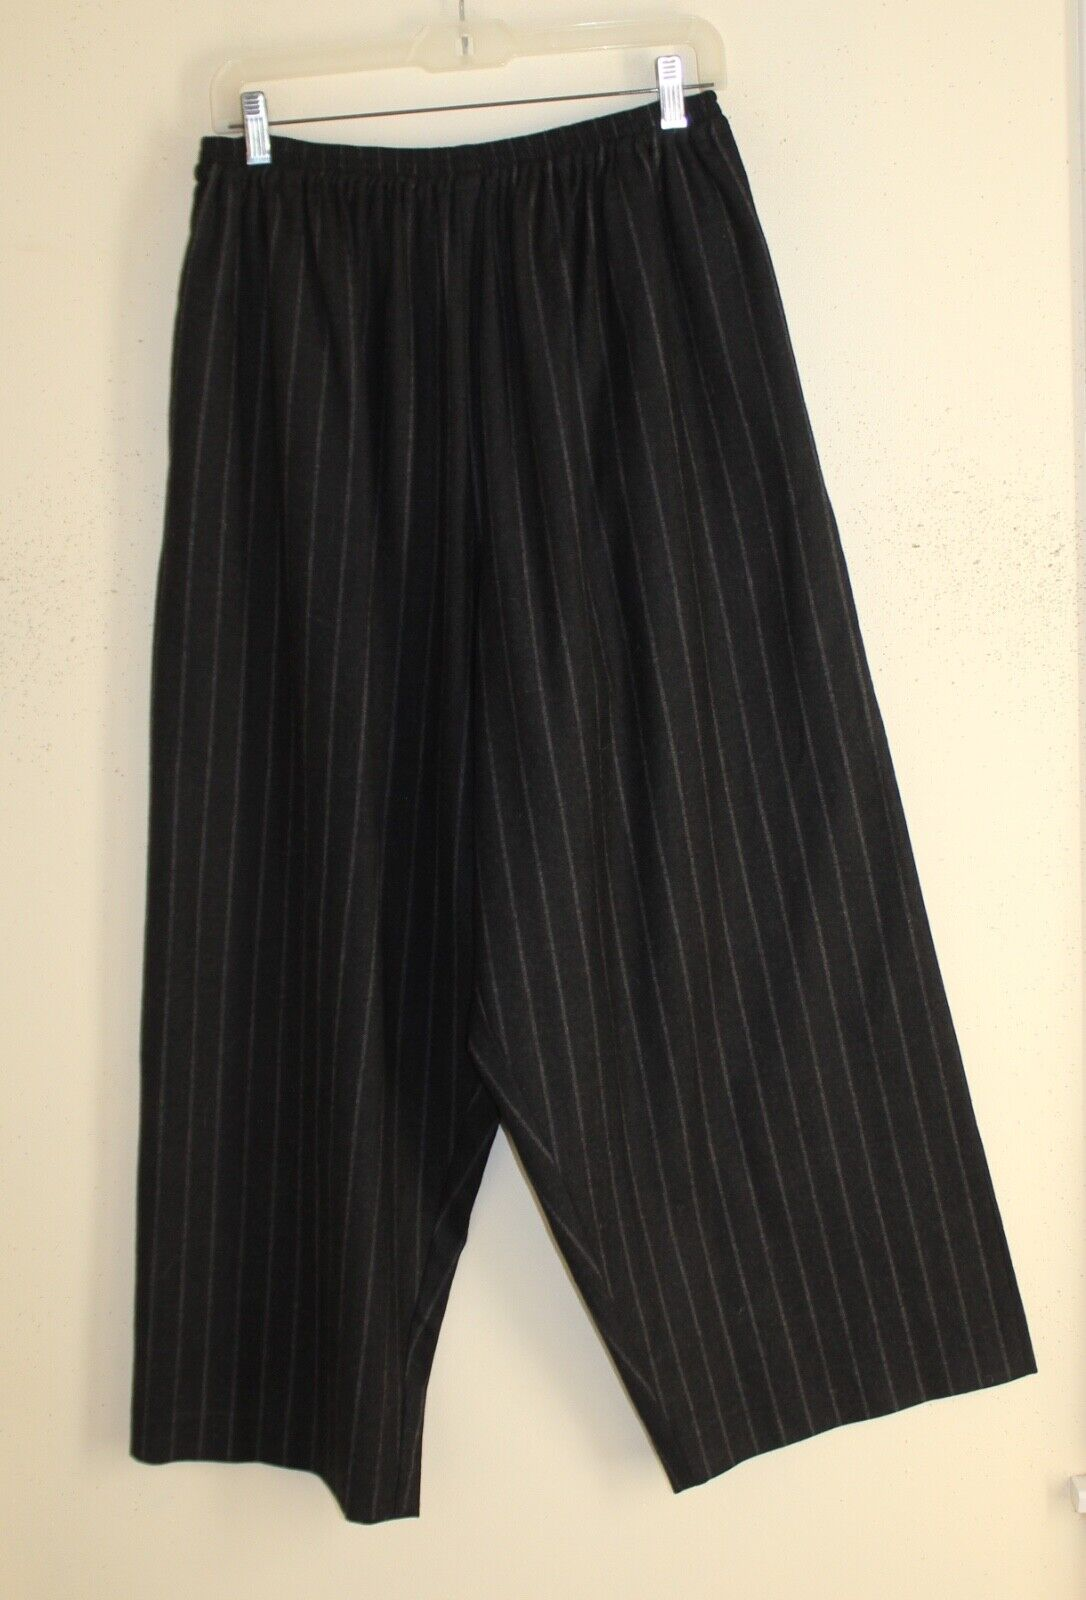 Eskandar -Sz 2 EXQUISITE Charcoal Striped Wool Flannel Japanese Trousers Pants